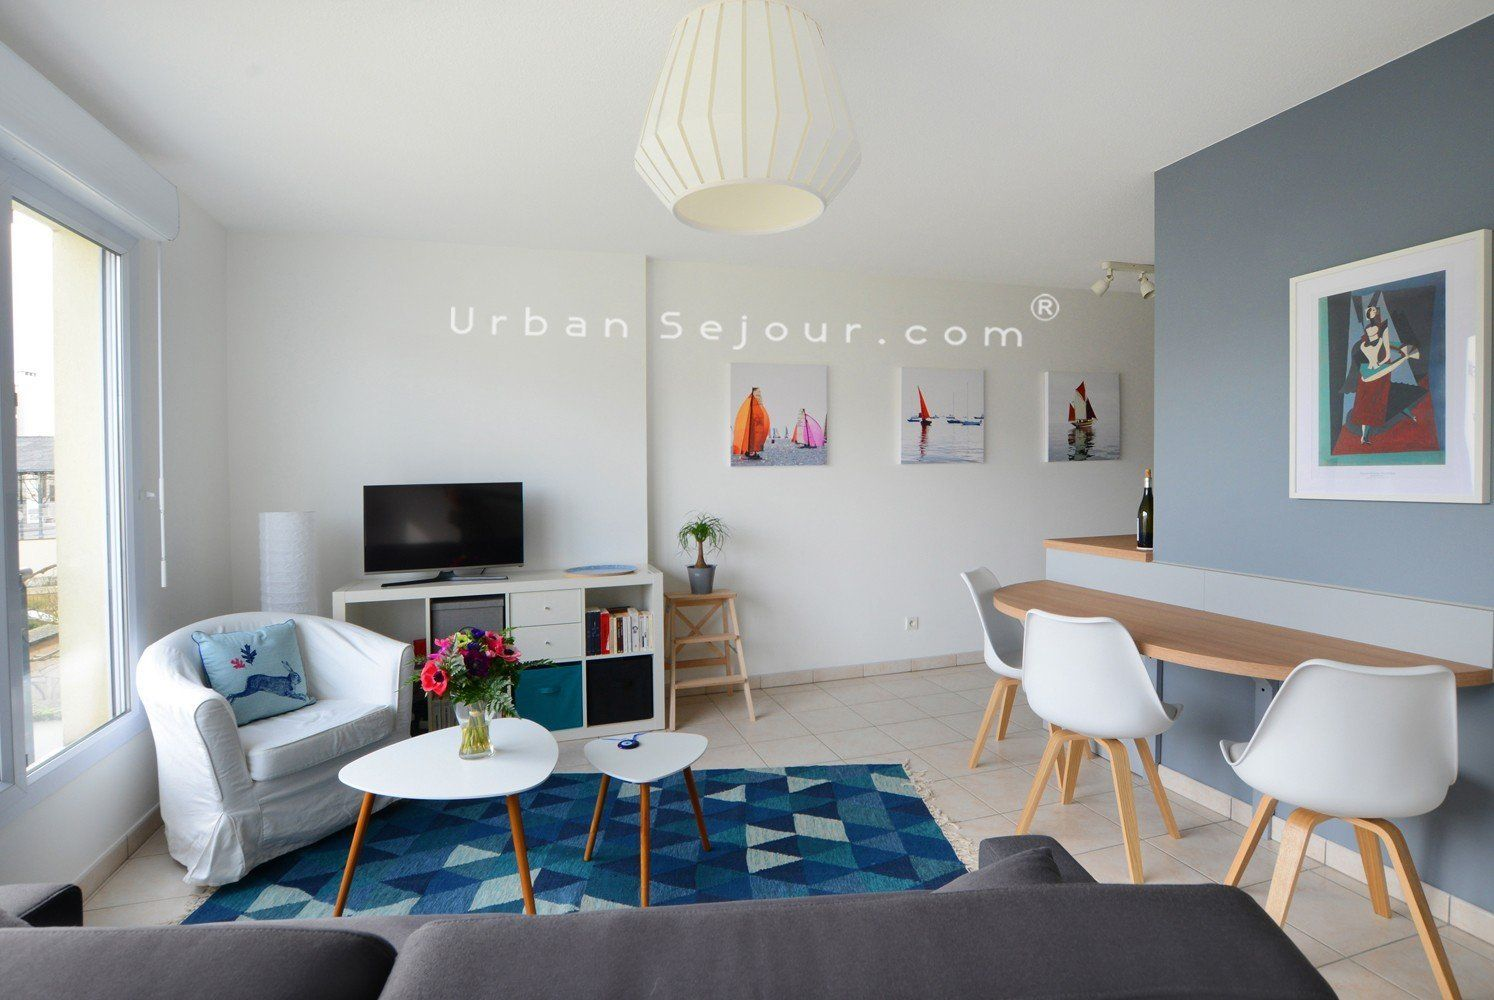 location appartement avec 1 chambre location saisonni re. Black Bedroom Furniture Sets. Home Design Ideas